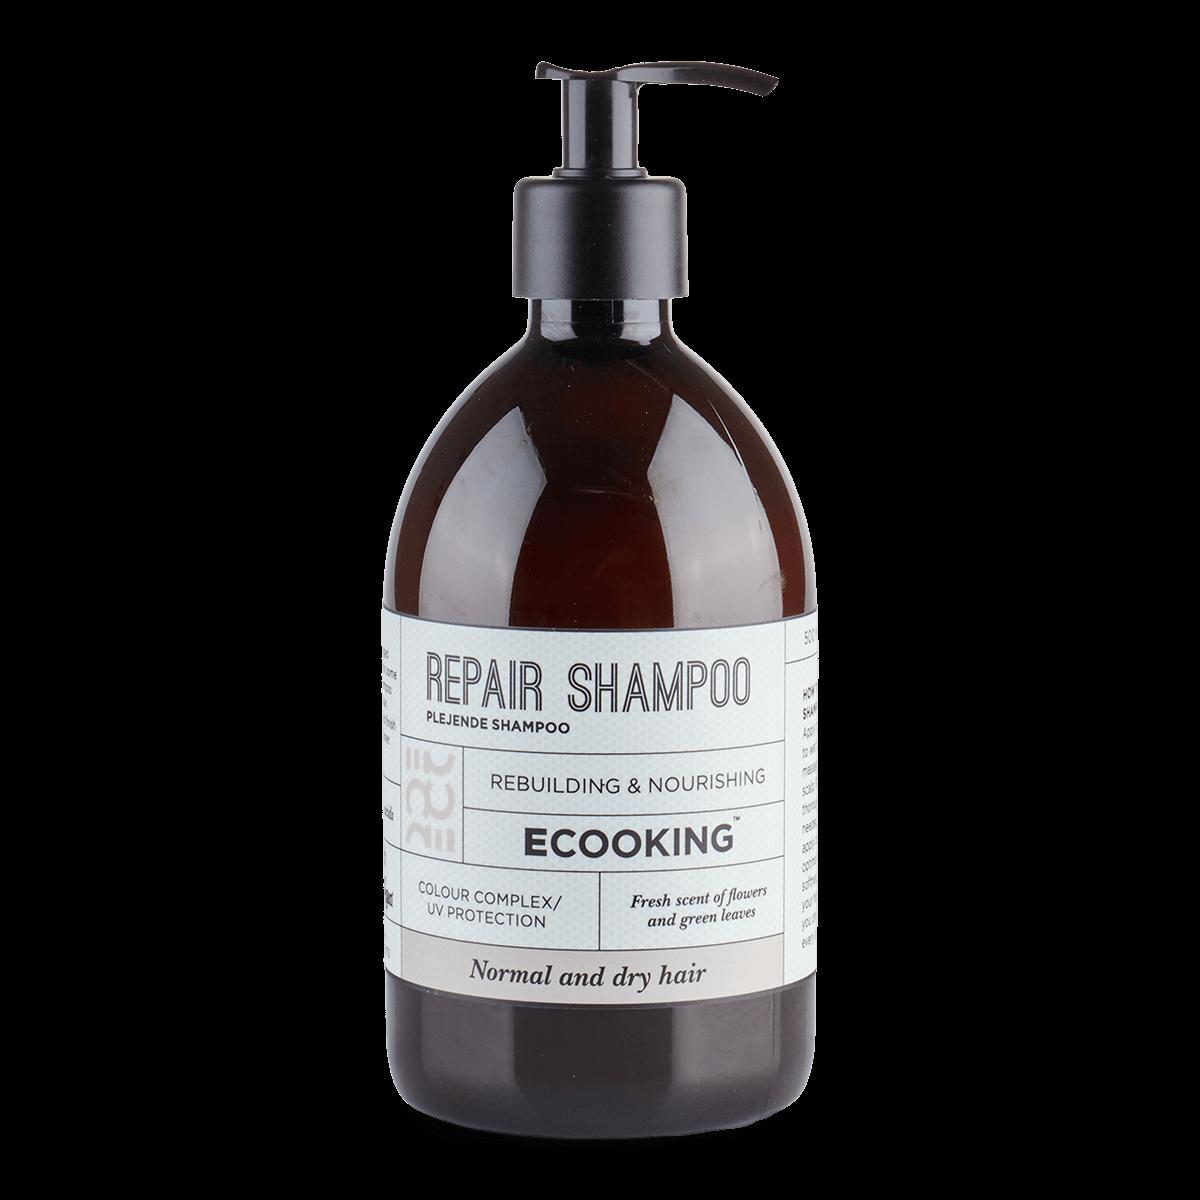 repair-shampoo-ecooking-500ml